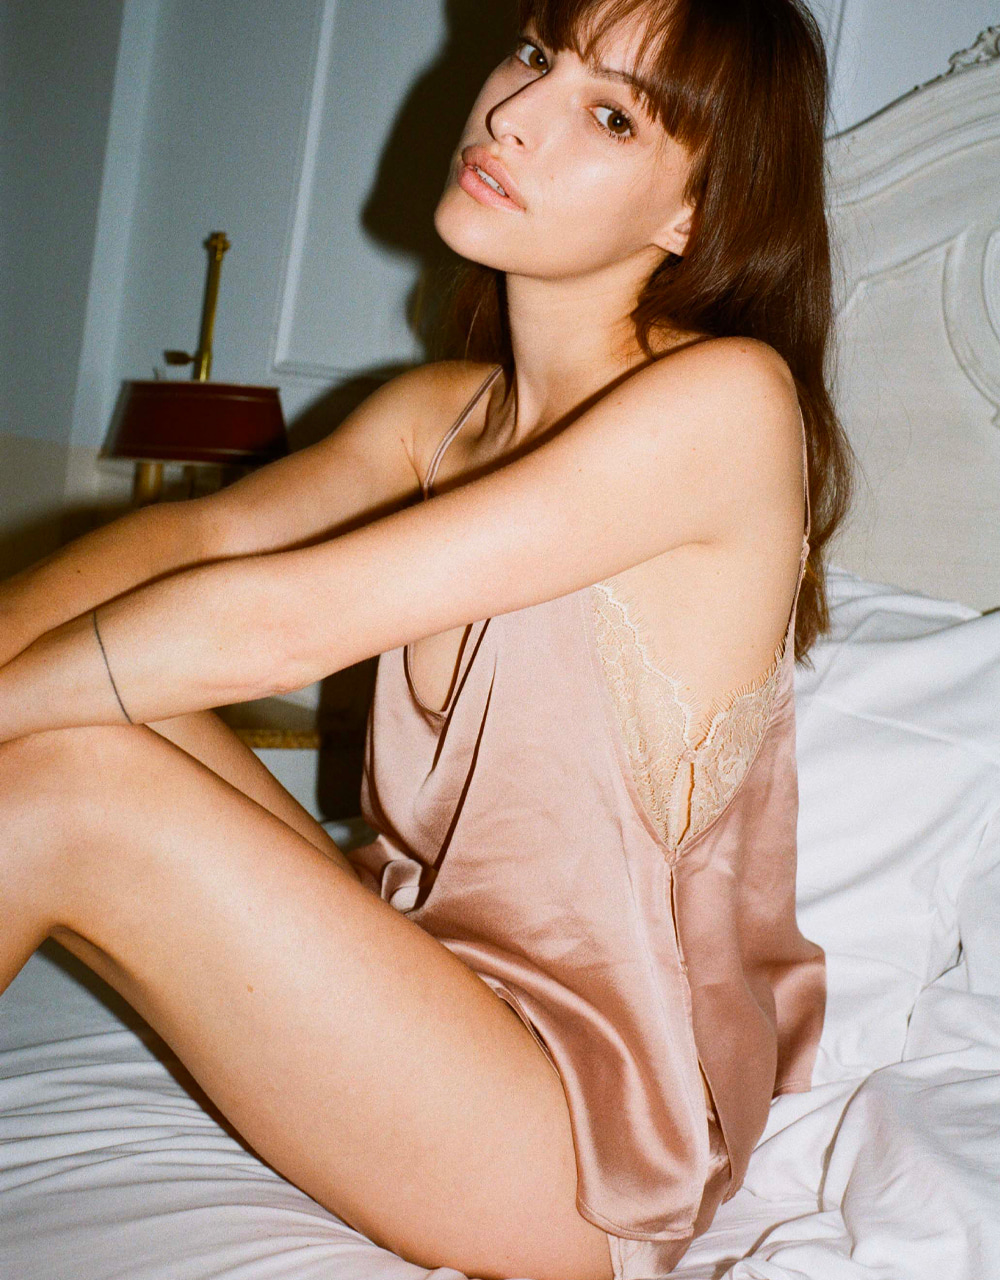 lingerie top Charlie Moka 35 € Girls In Paris photo 1